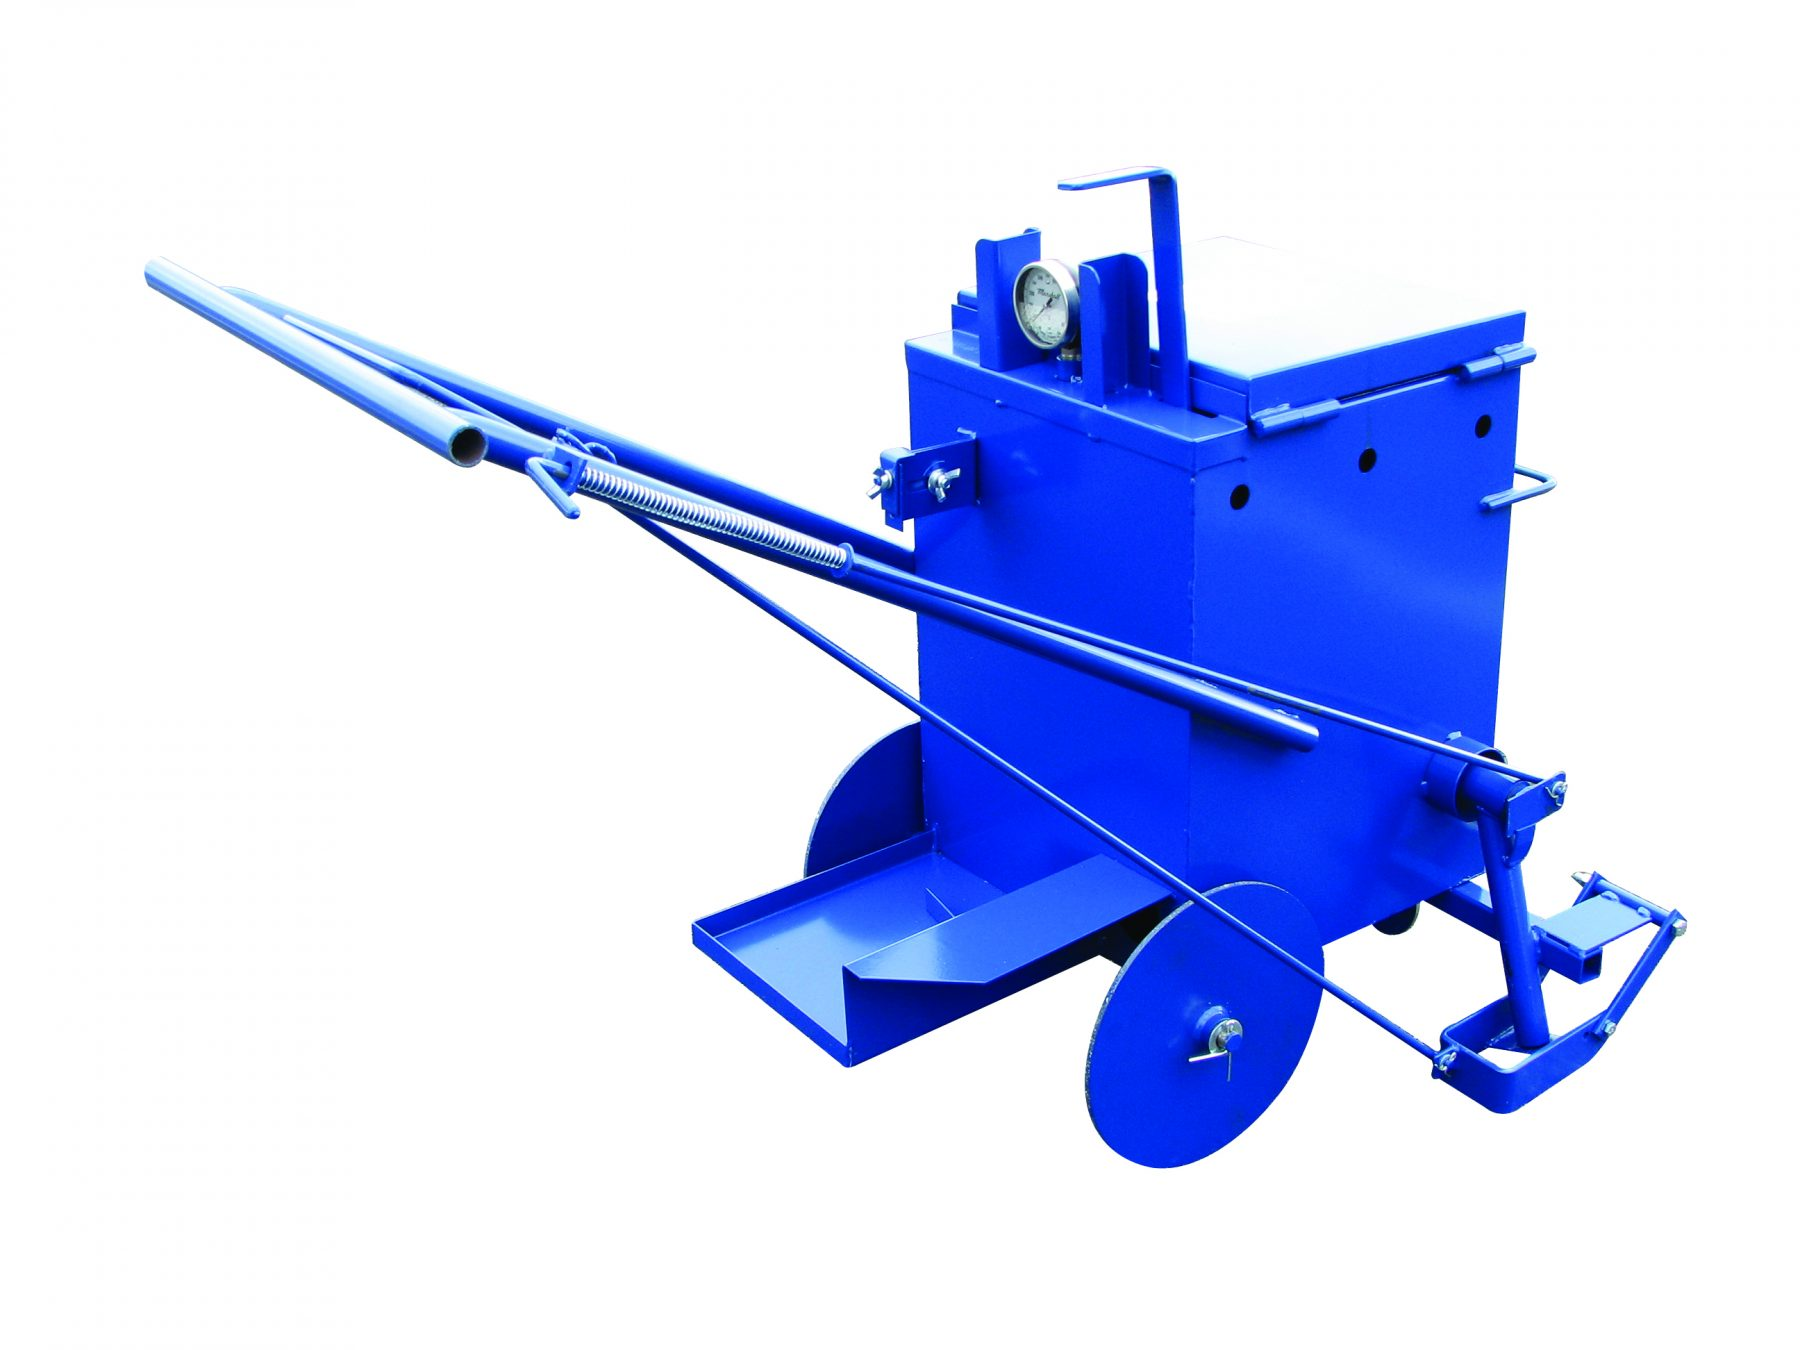 10 Gallon Wheeled Melter/Applicator